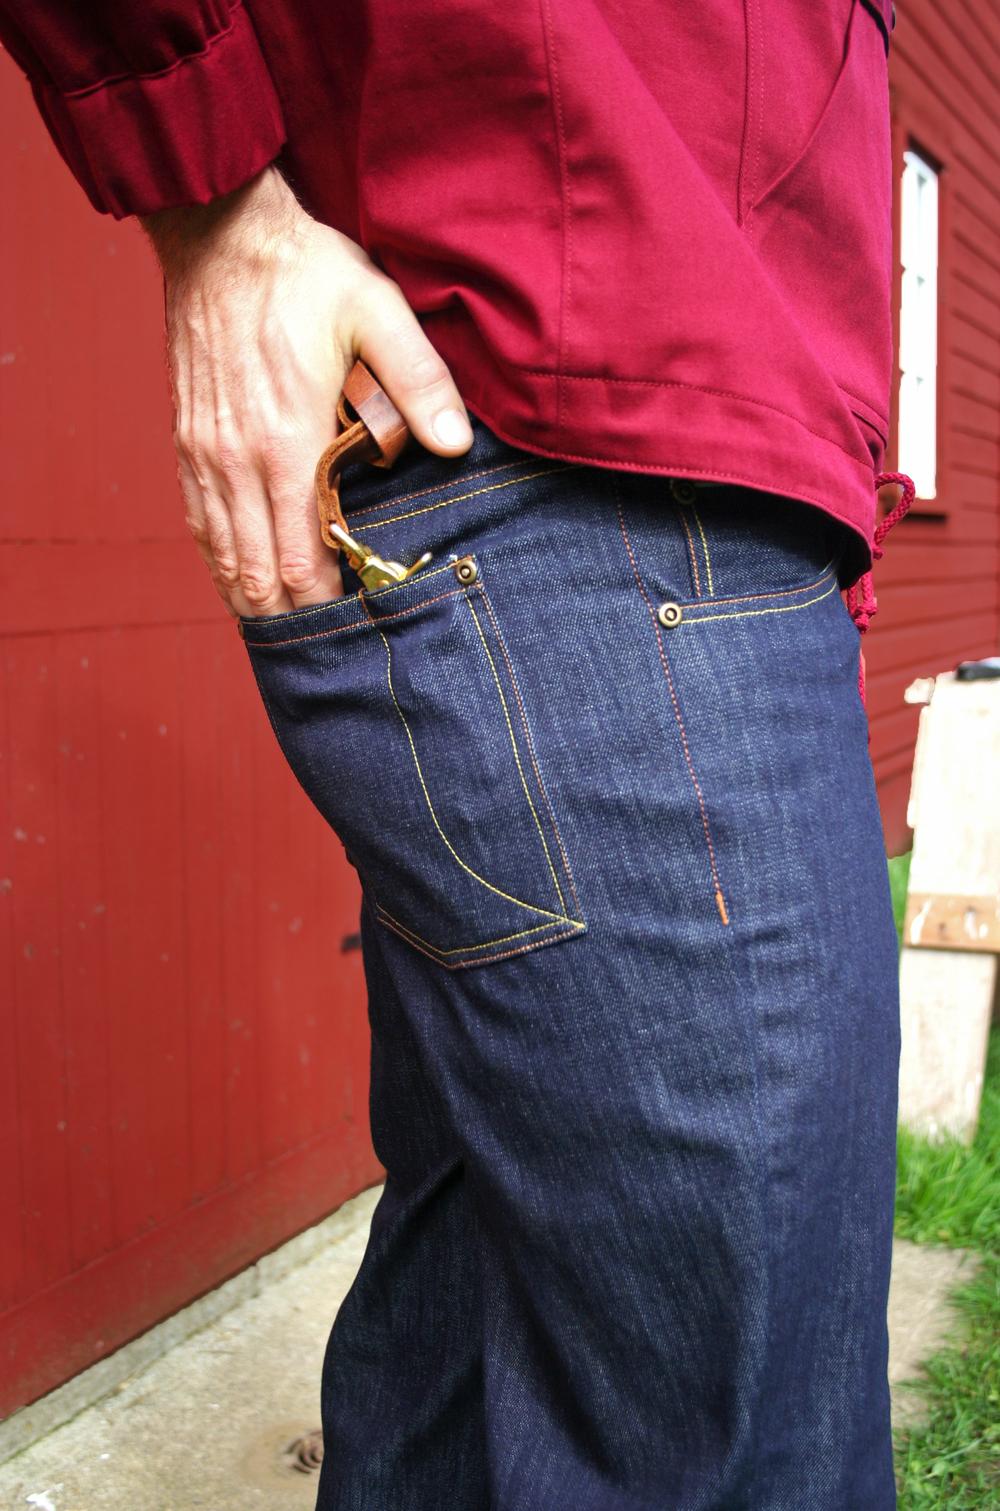 Straight edge jean